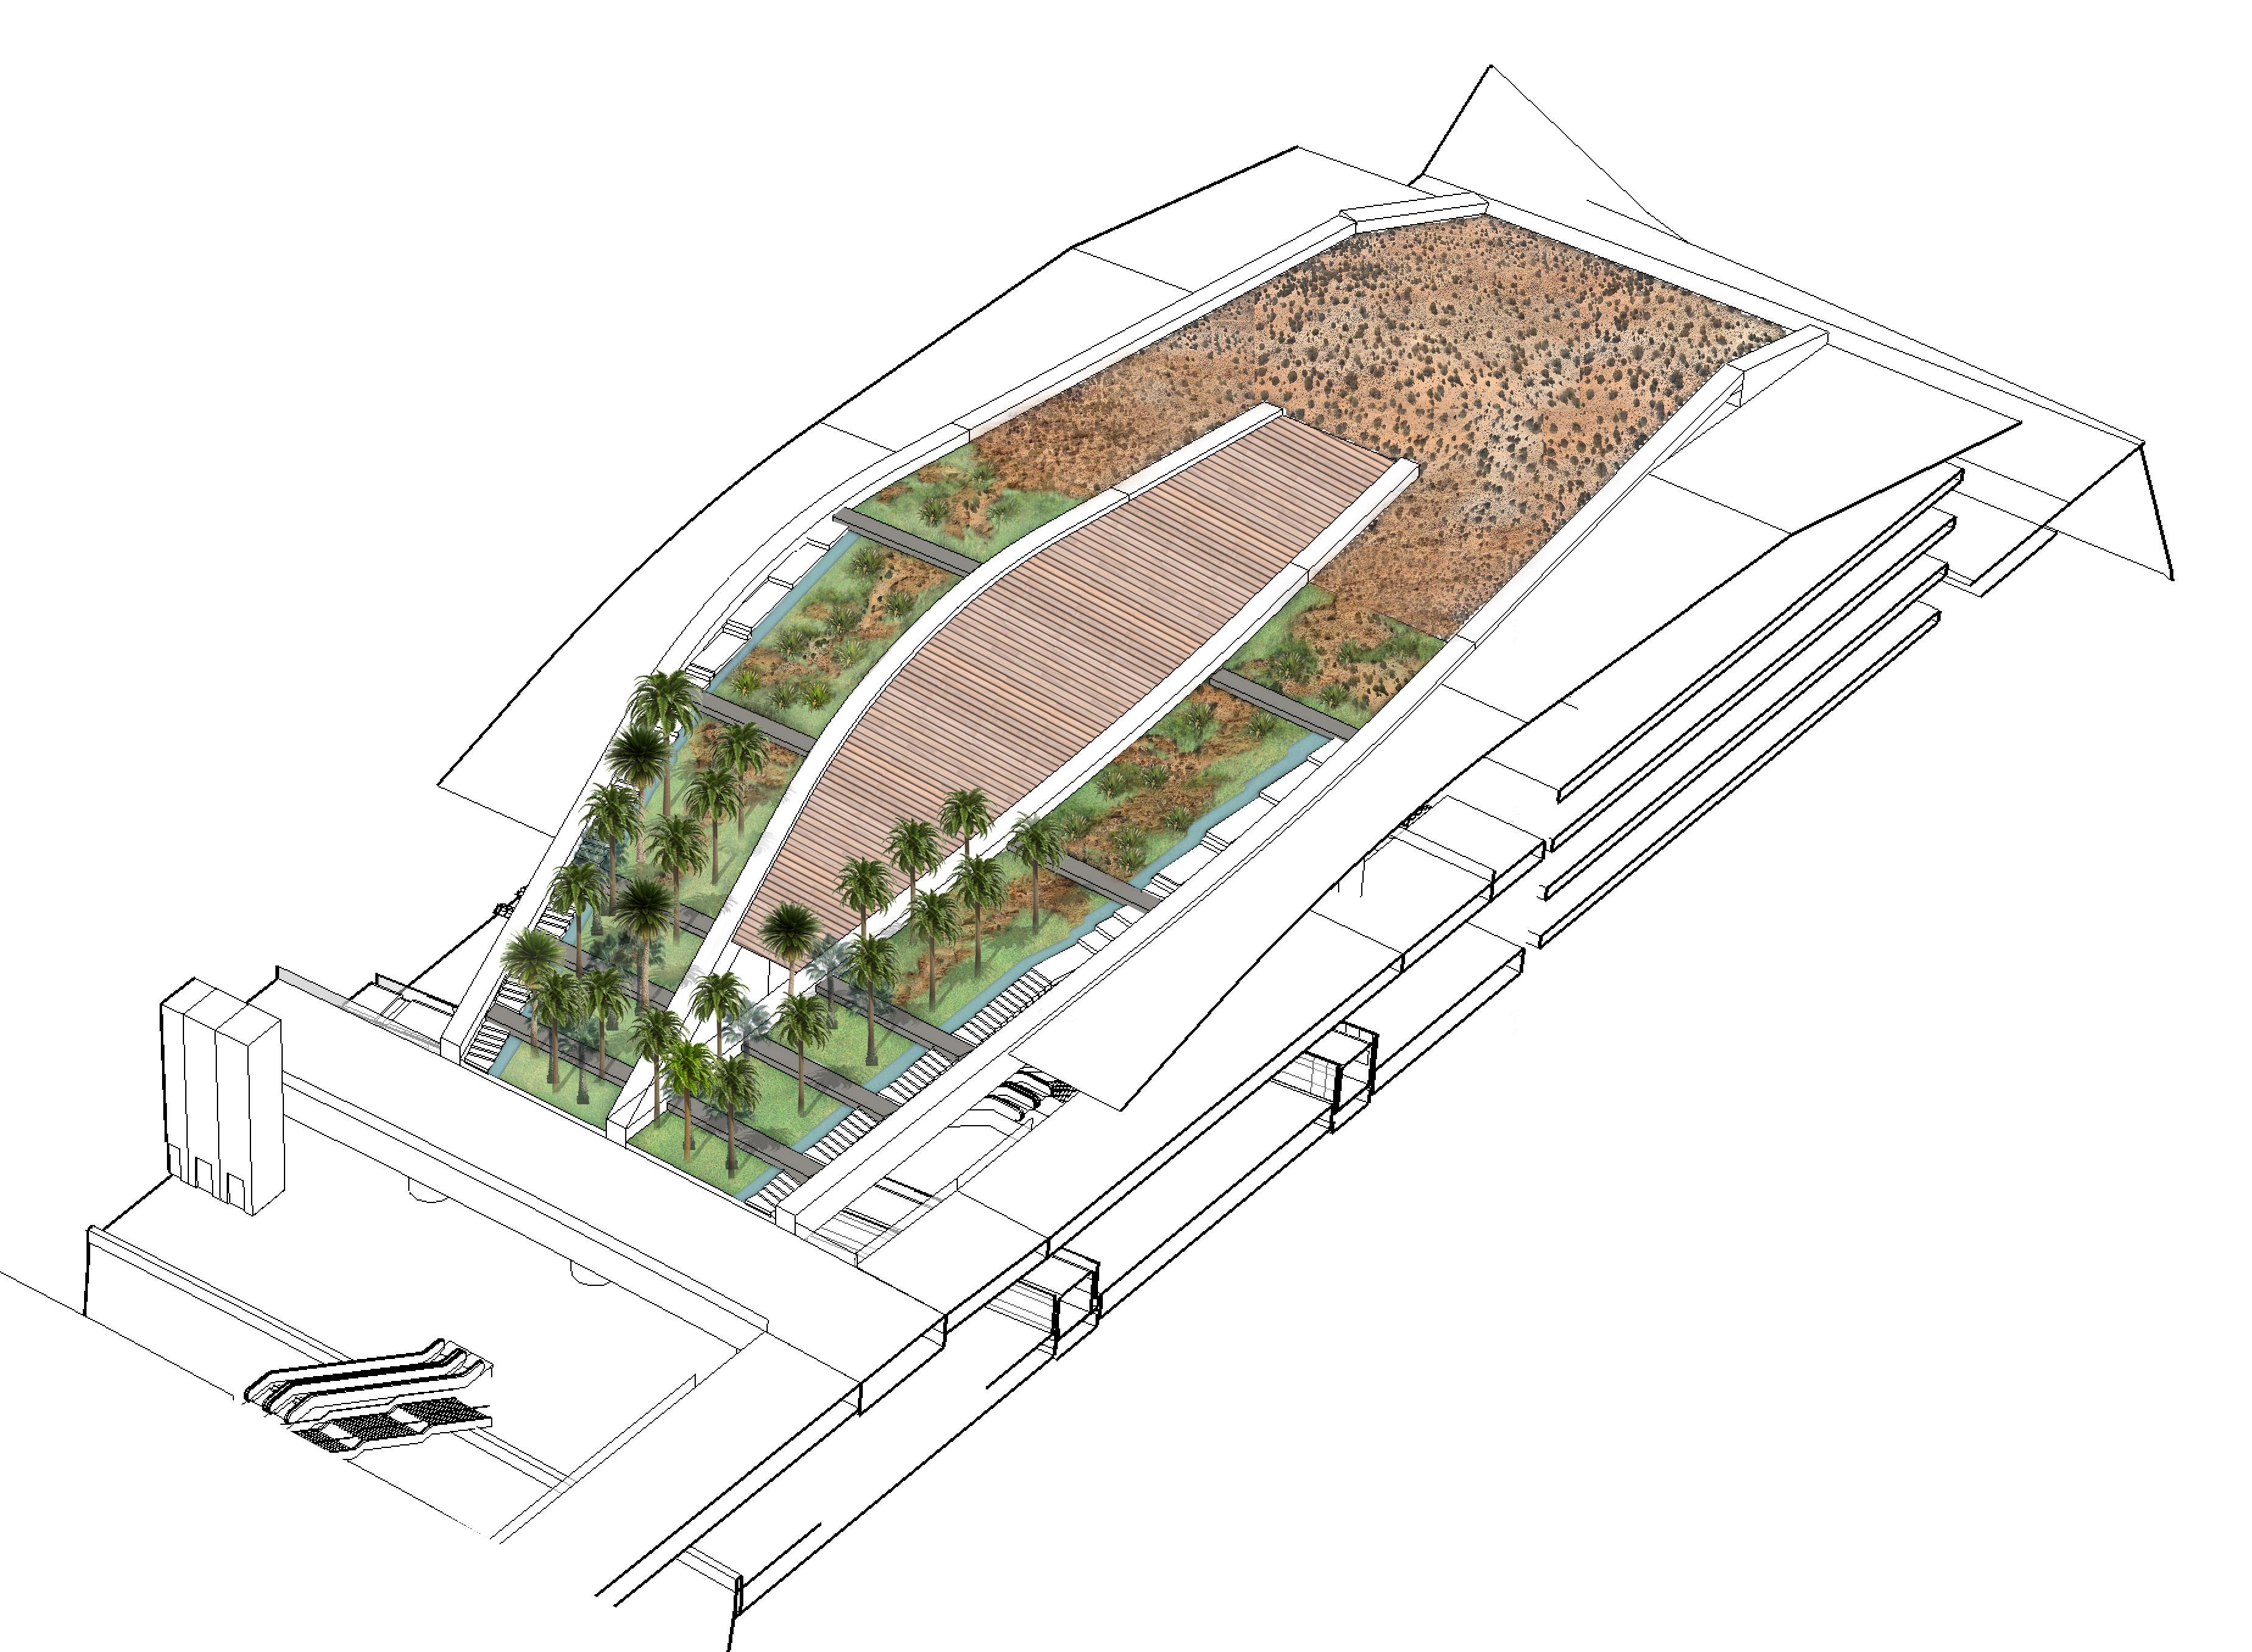 landscapeaxo_roof-render